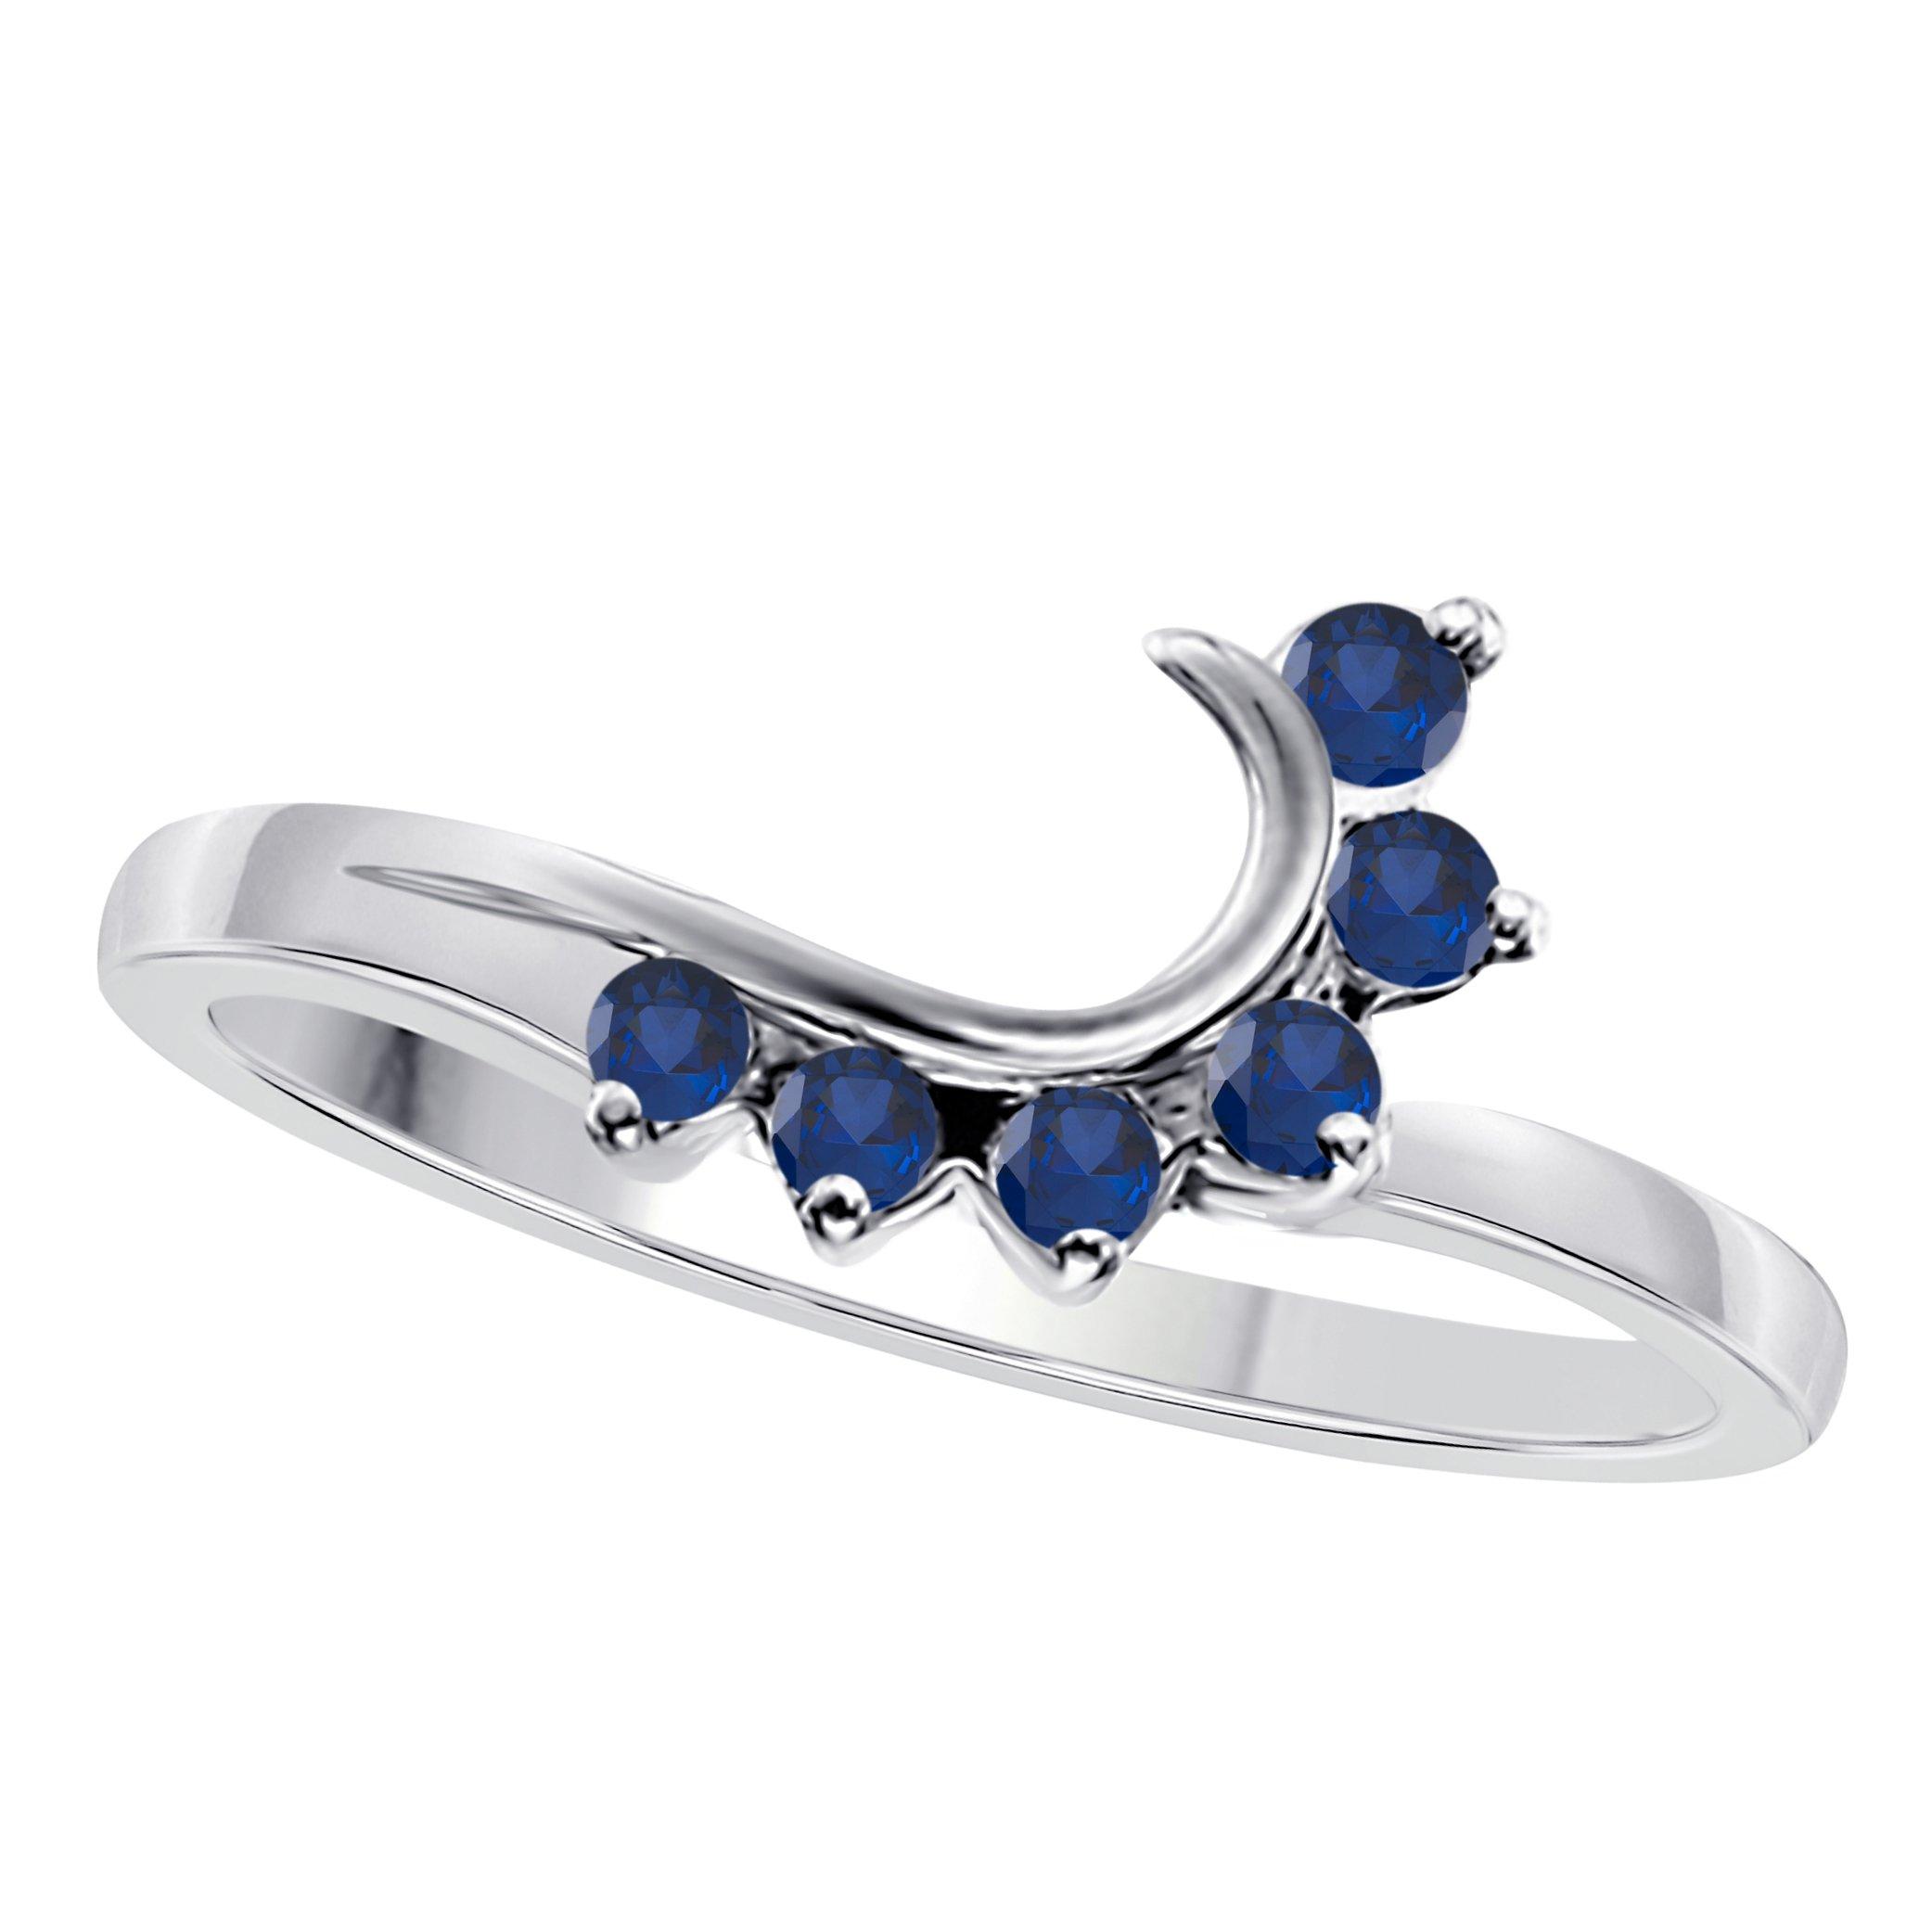 Star Retail 14K White Gold Finish Round CZ Blue Sapphire Wedding Band Enhancer Guard Double Ring